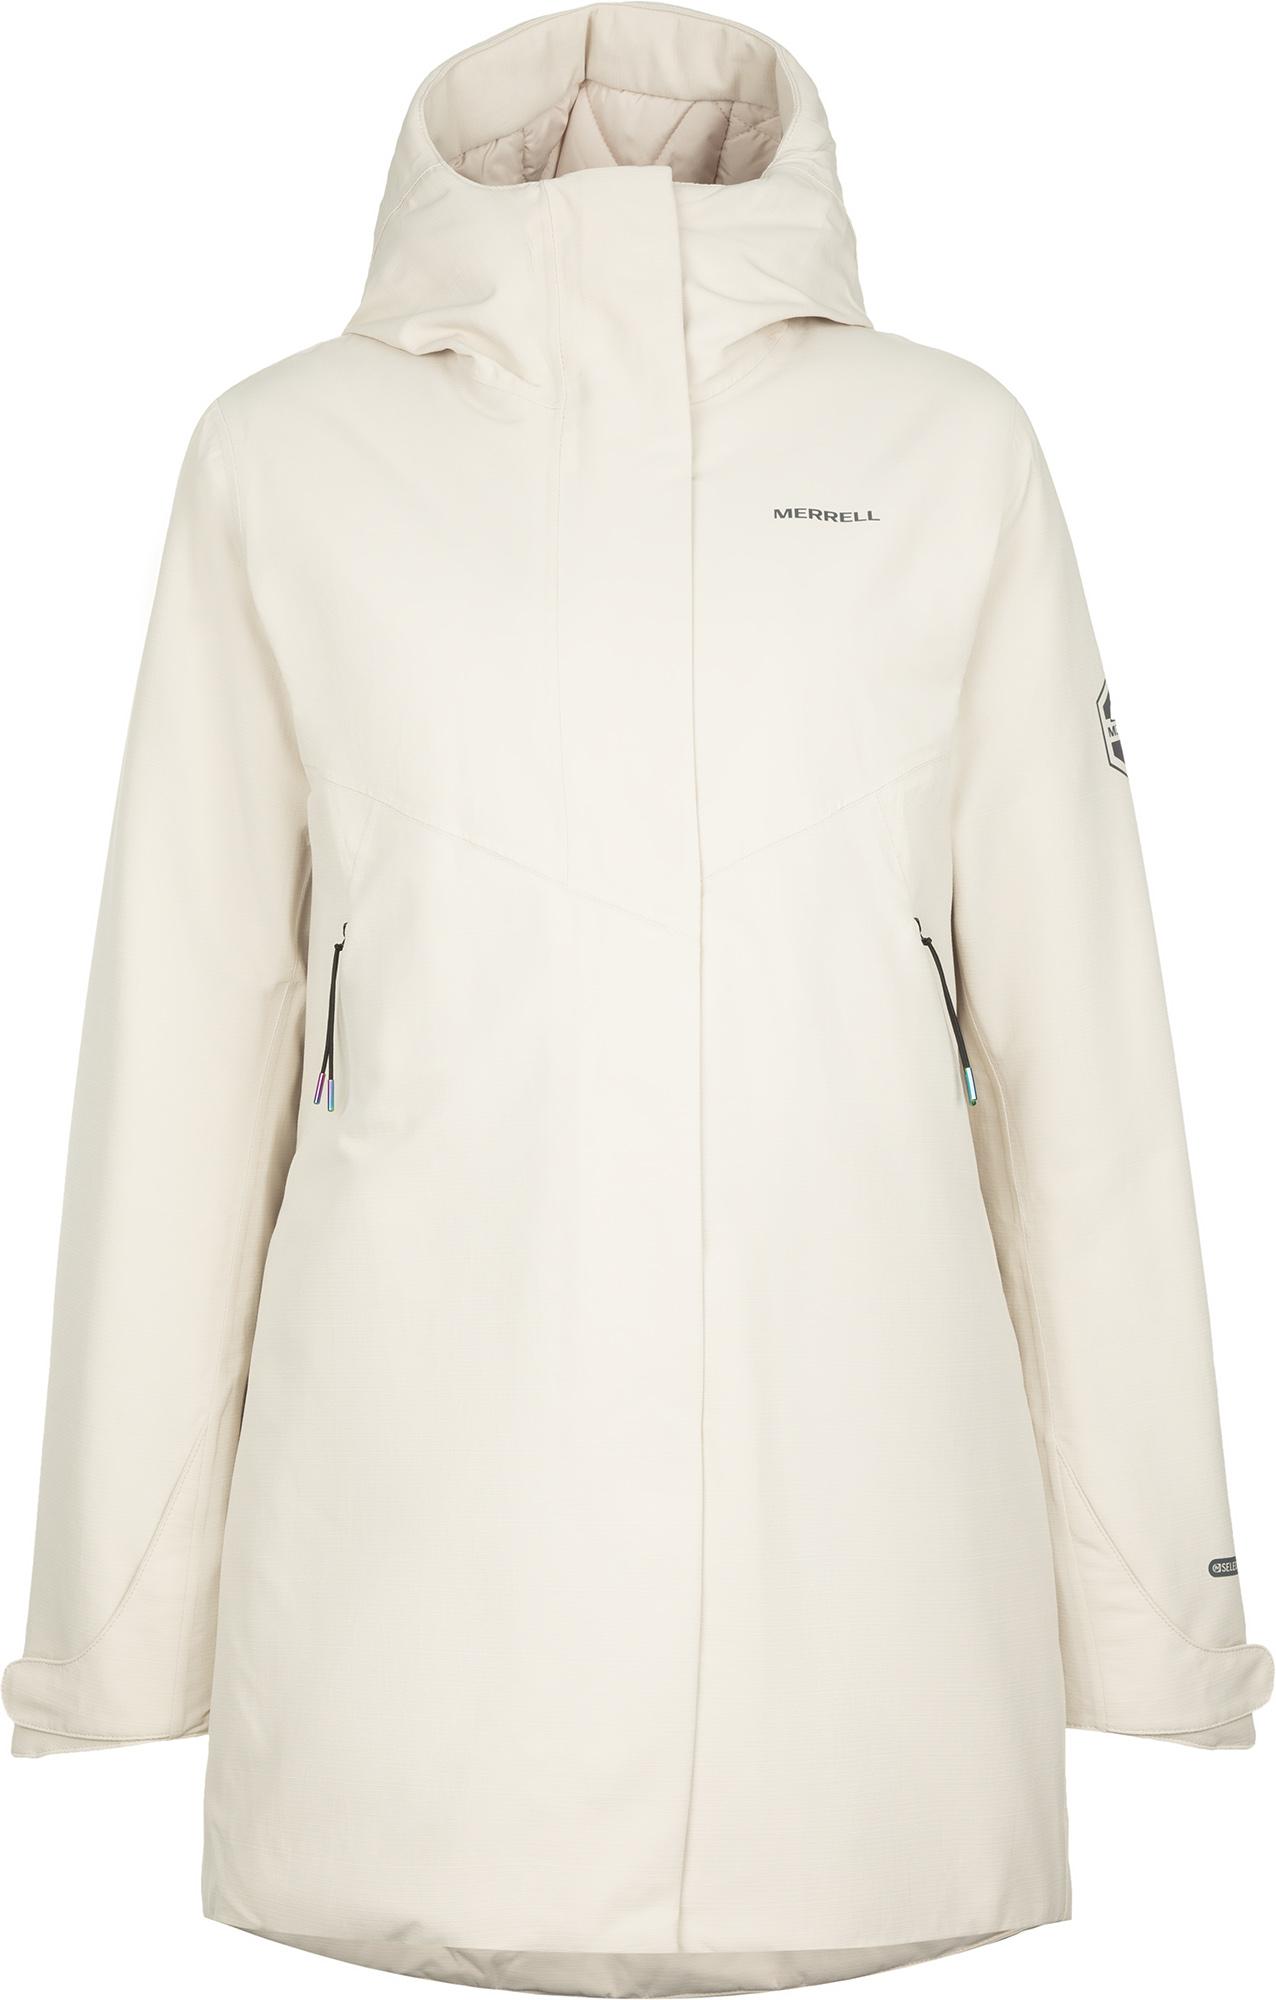 Merrell Куртка женская Merrell, размер 42 merrell платье женское merrell размер 42